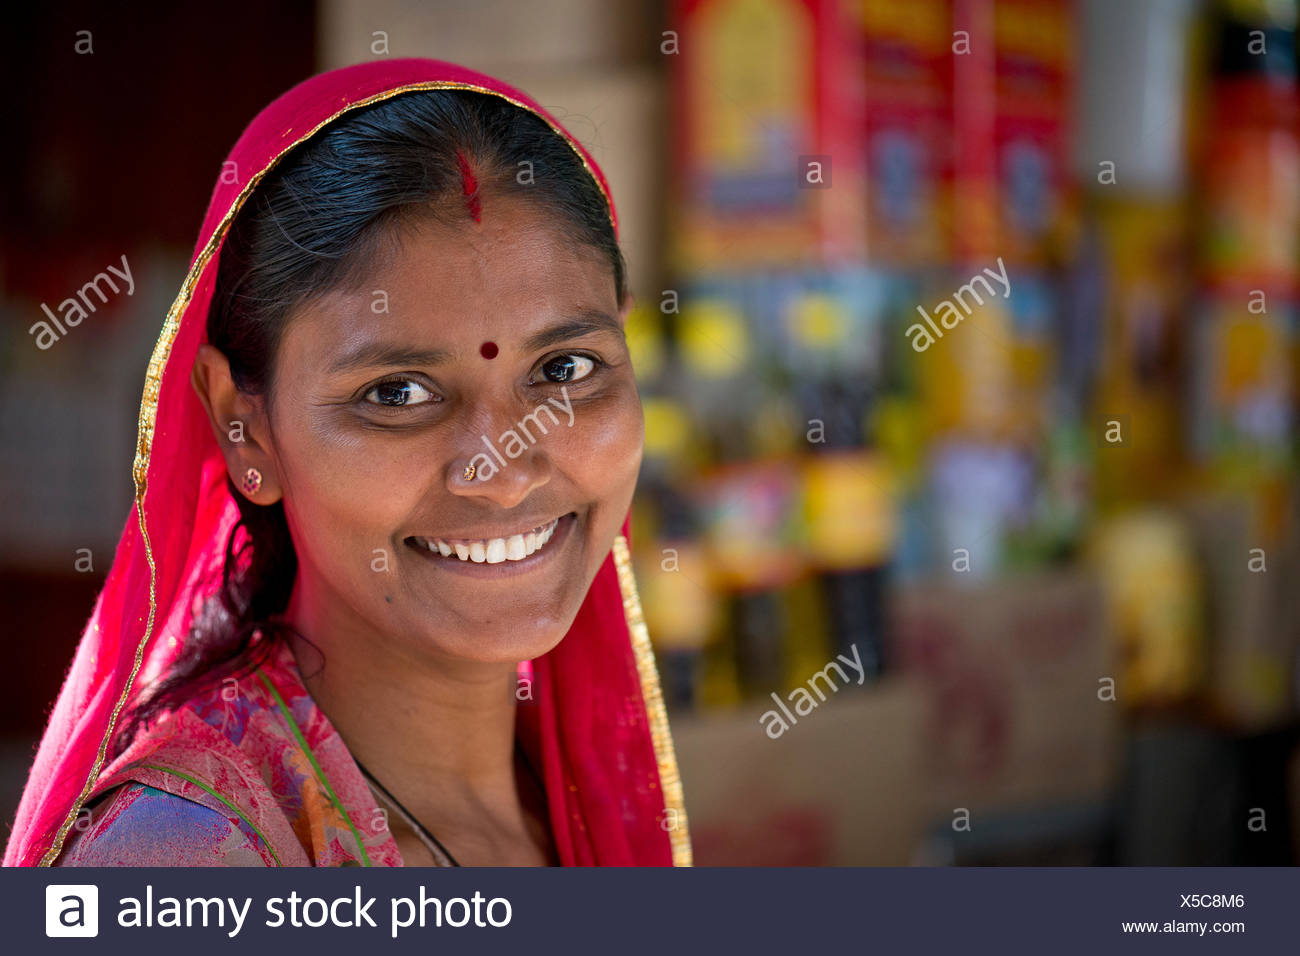 Smiling Indian woman wearing a dupatta scarf with a bindi, portrait, Jodhpur, Rajasthan, India - Stock Image